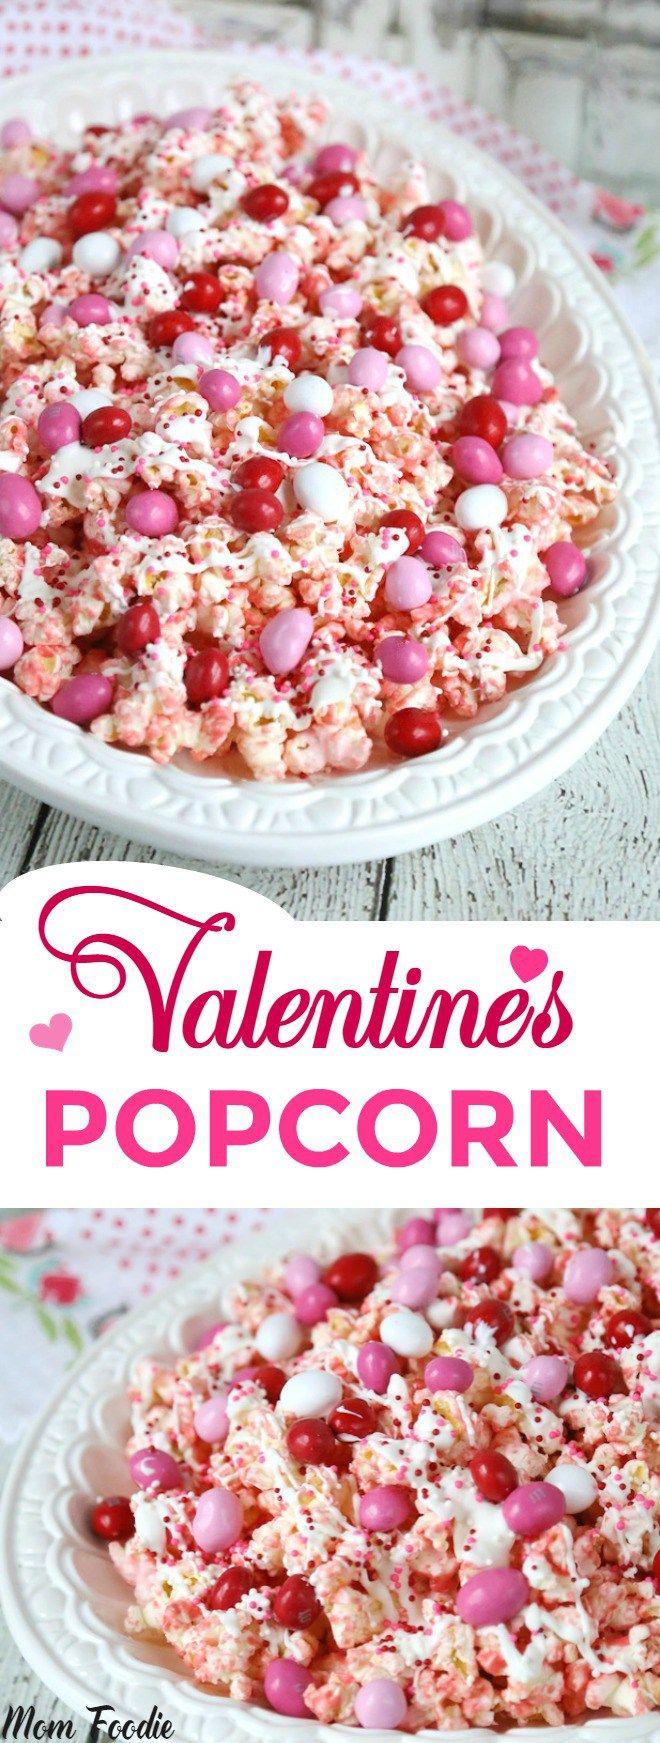 Valentines Day Popcorn Recipe Pink Chocolate Covered Popcorn